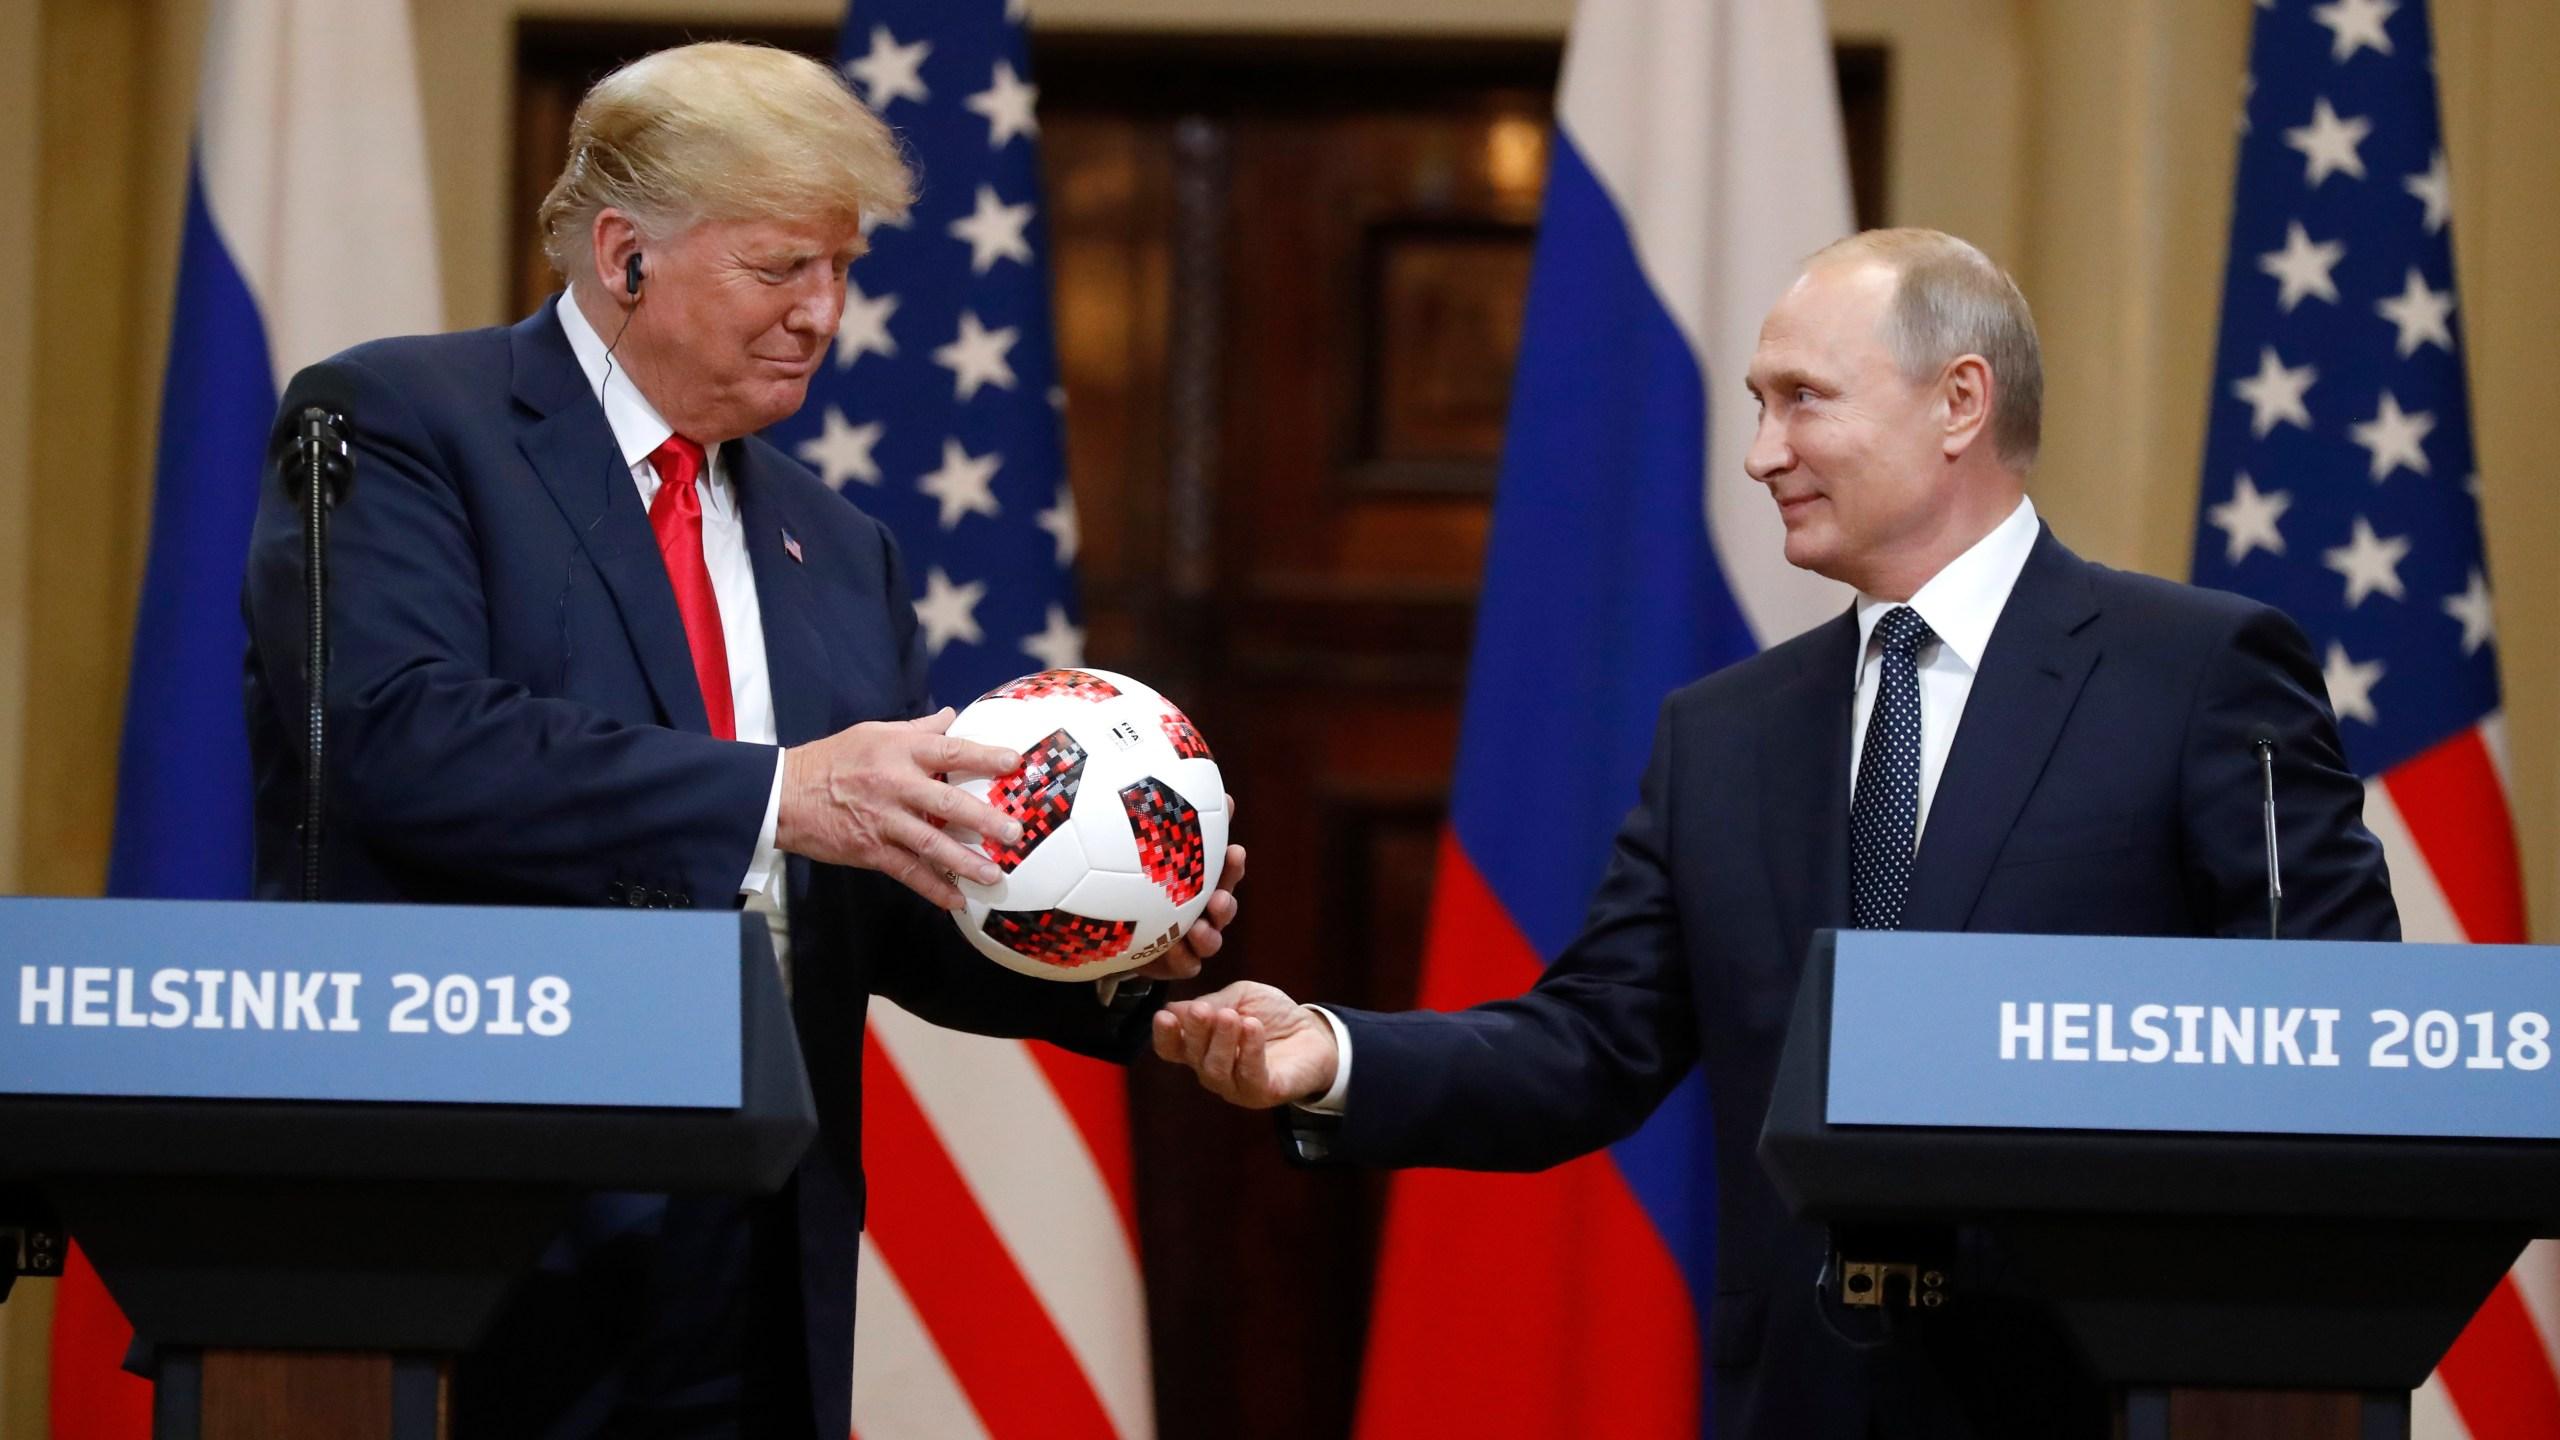 Finland_Trump_Putin_Summit_95421-159532.jpg88817907